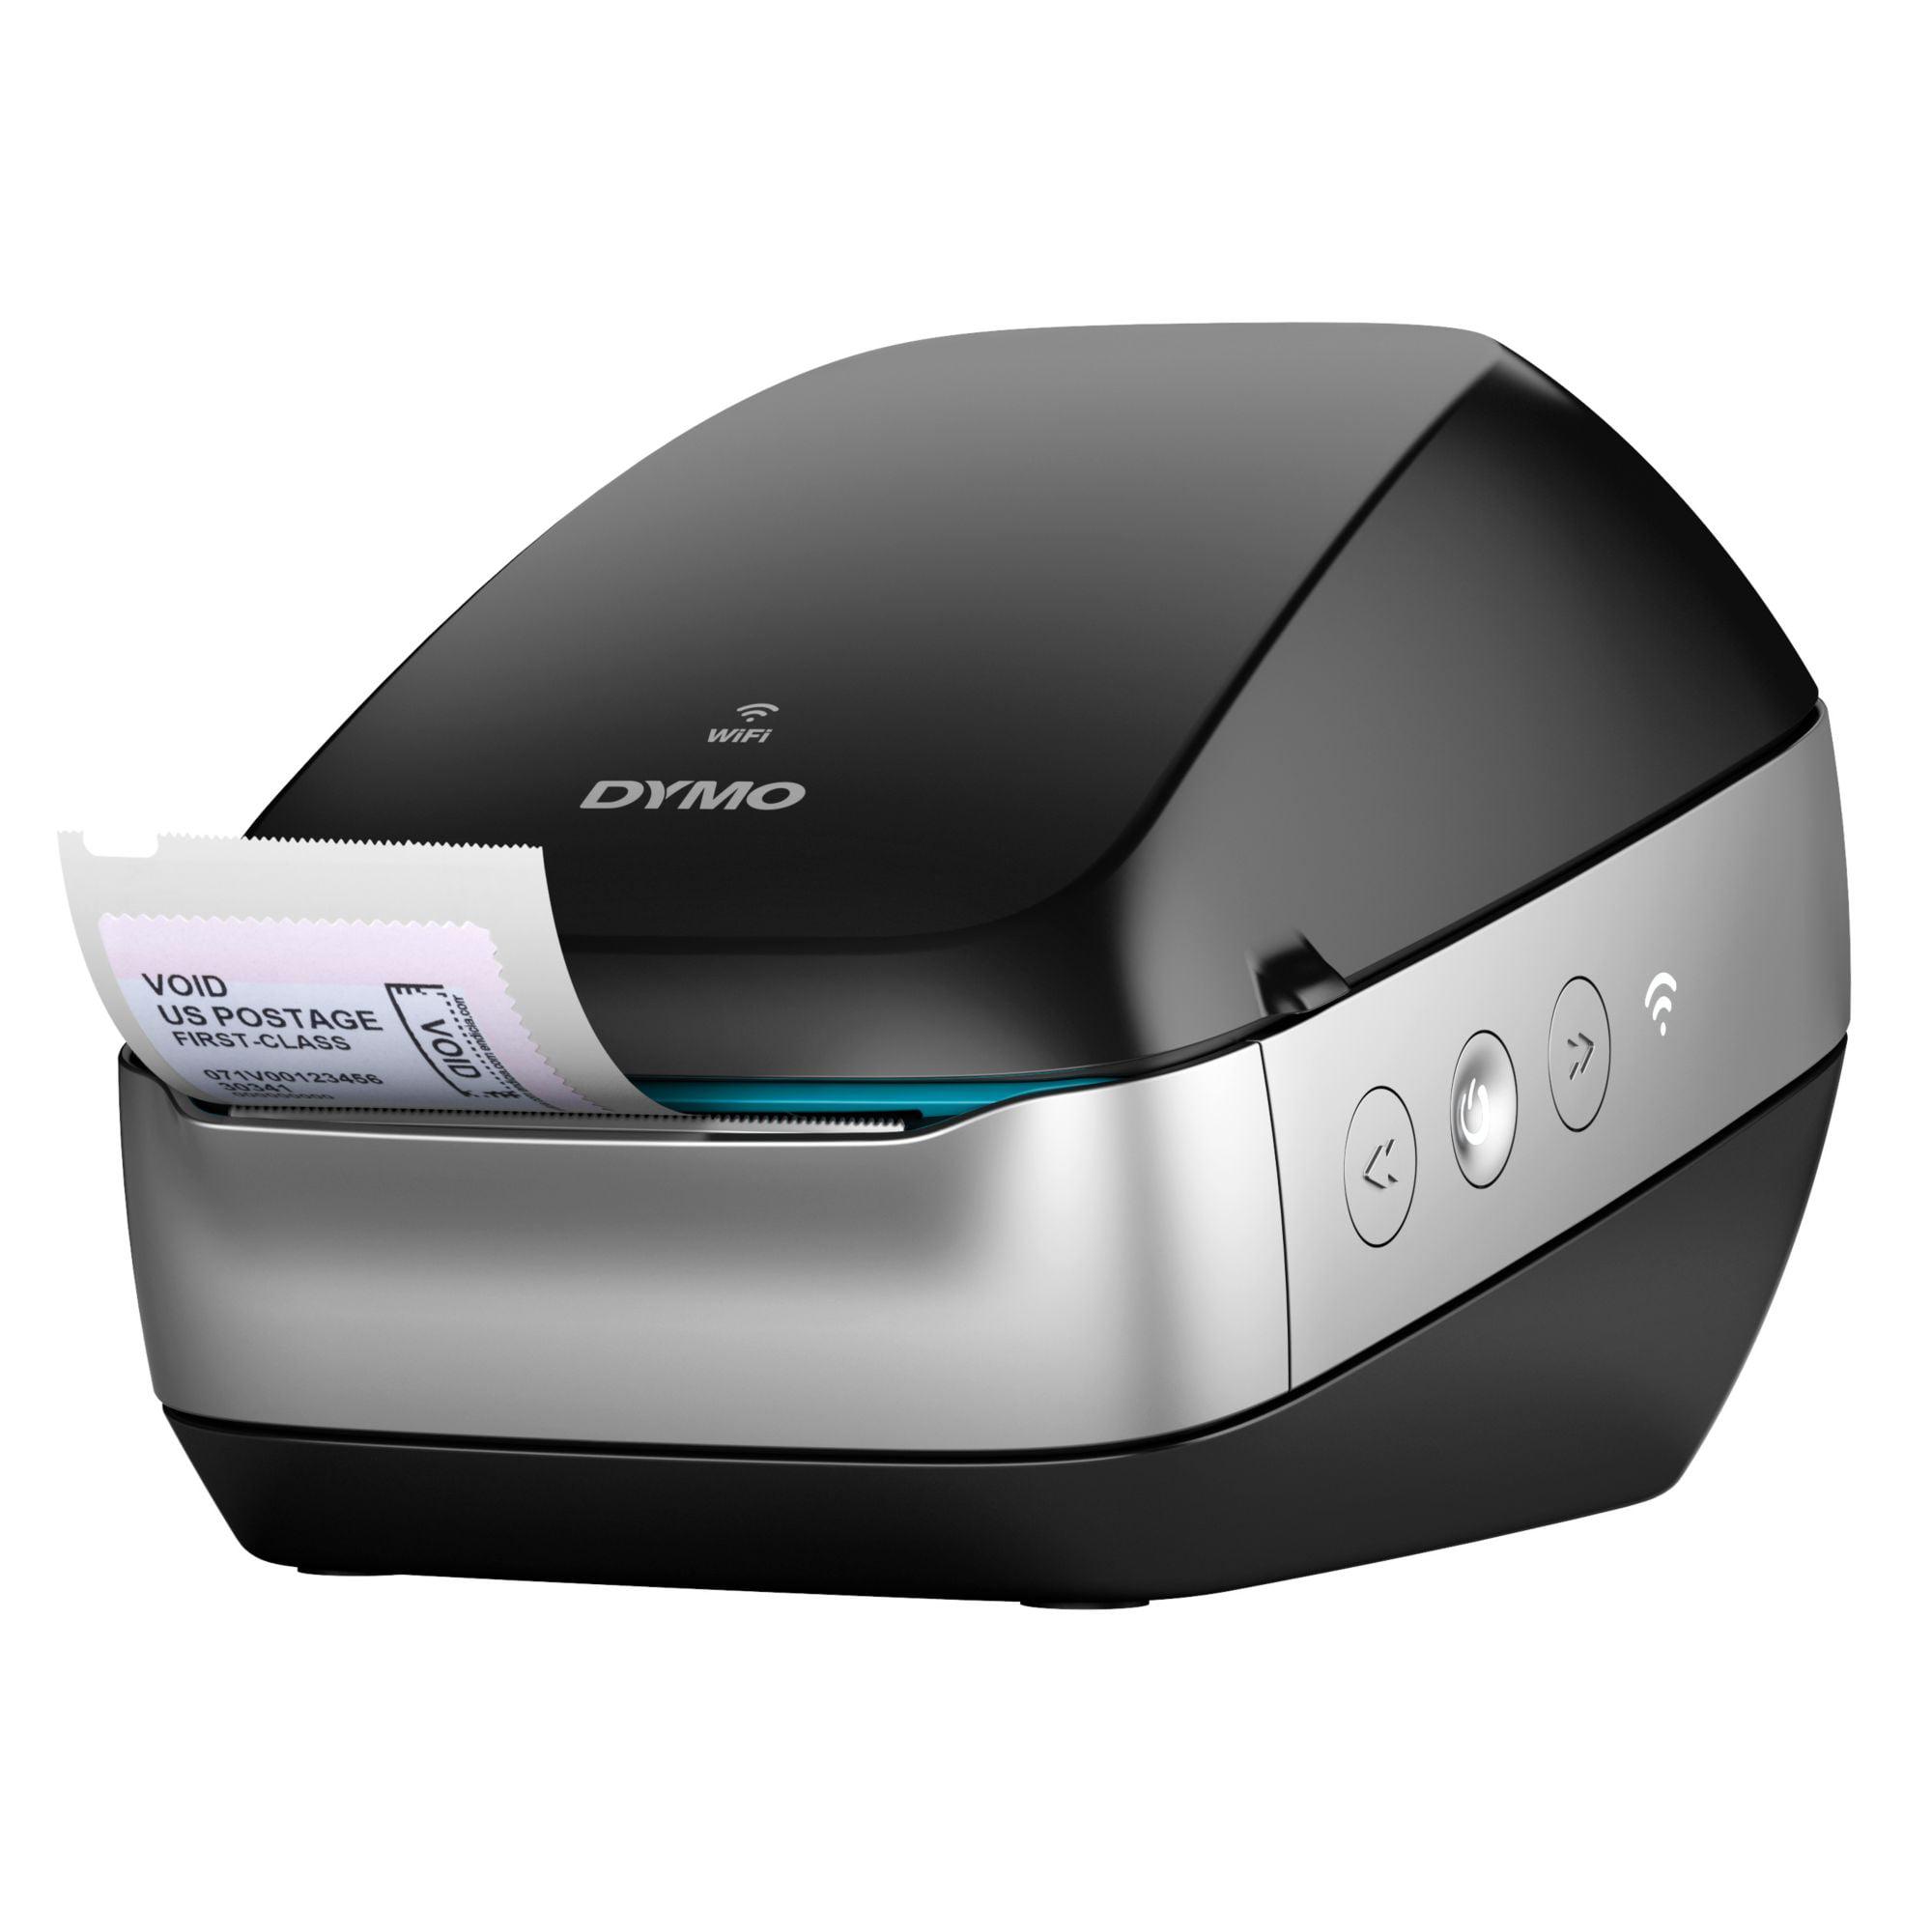 DYMO LabelWriter Wireless Label Printer, Black